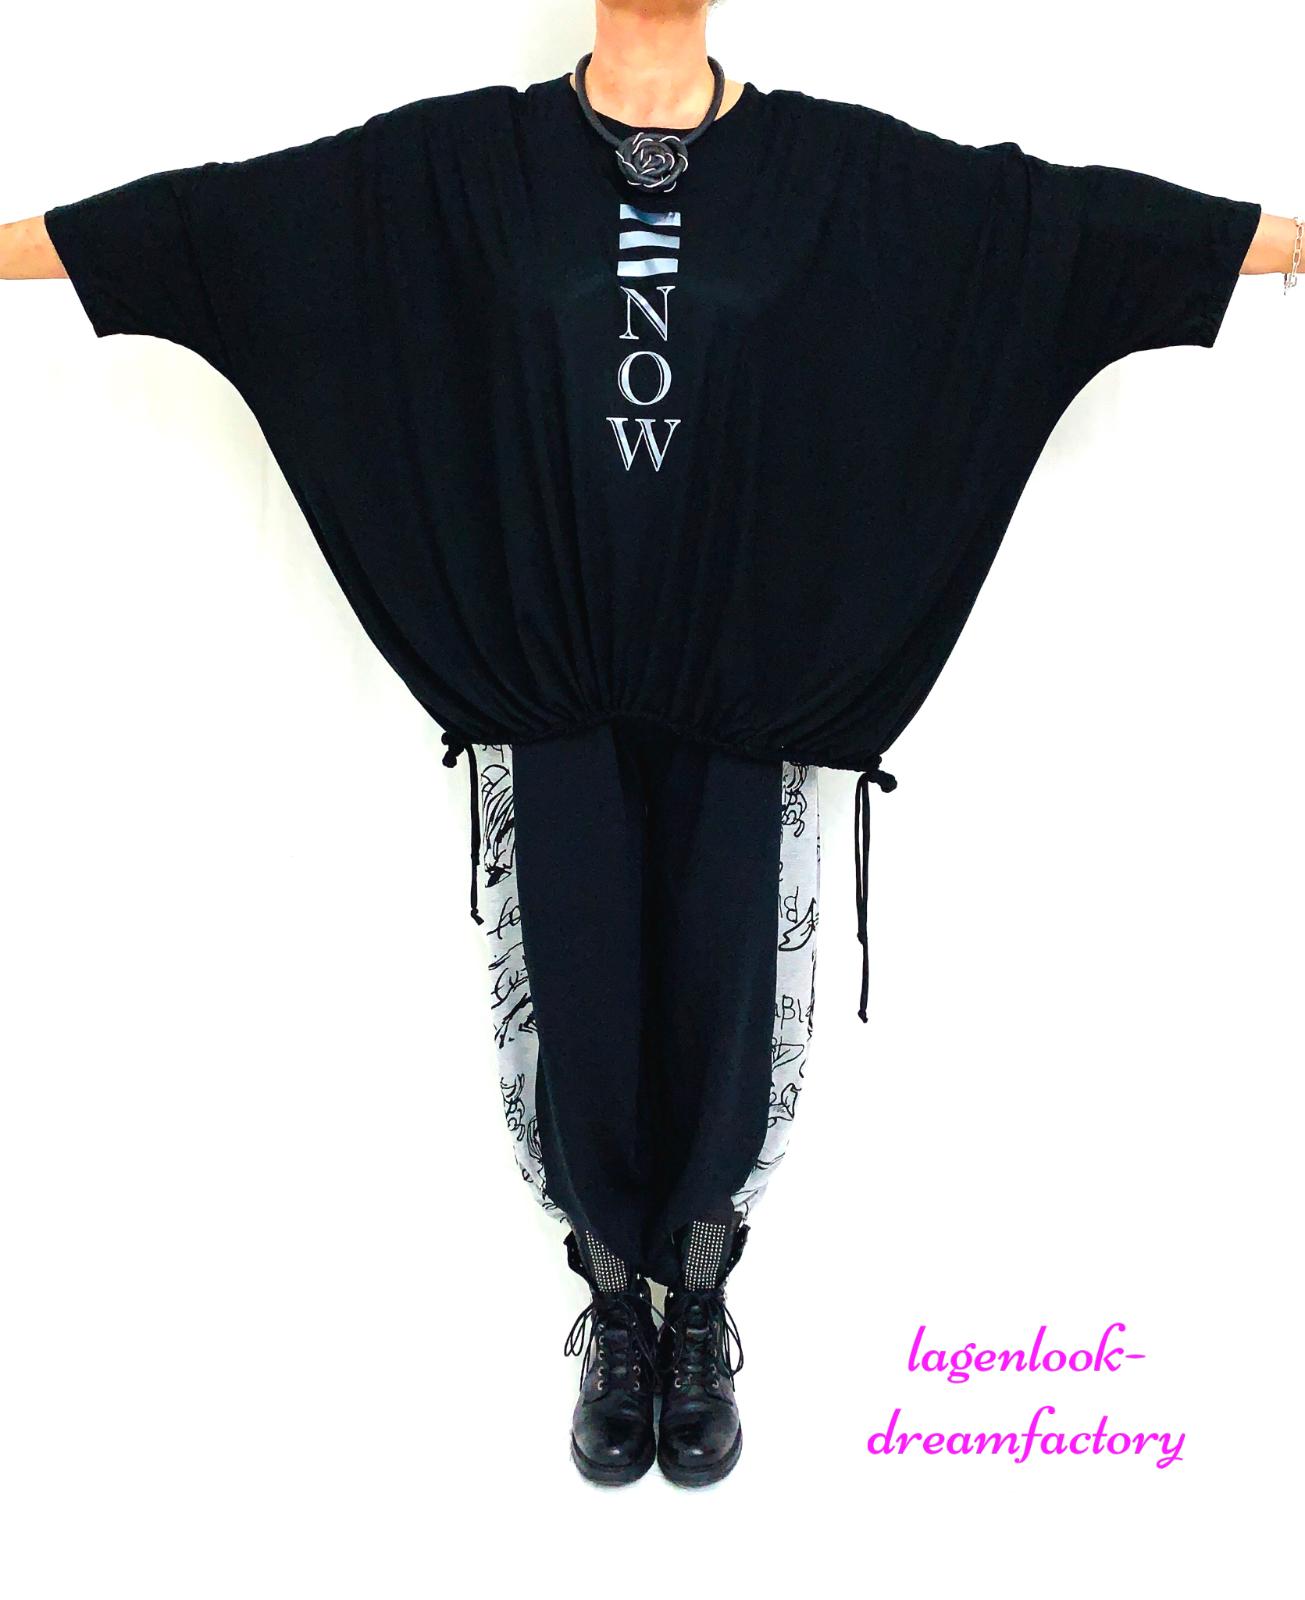 Lagenlook Oversize Blogger Kasten-Shirt Noir Smiley-Strass 46 48 50 52 56 58